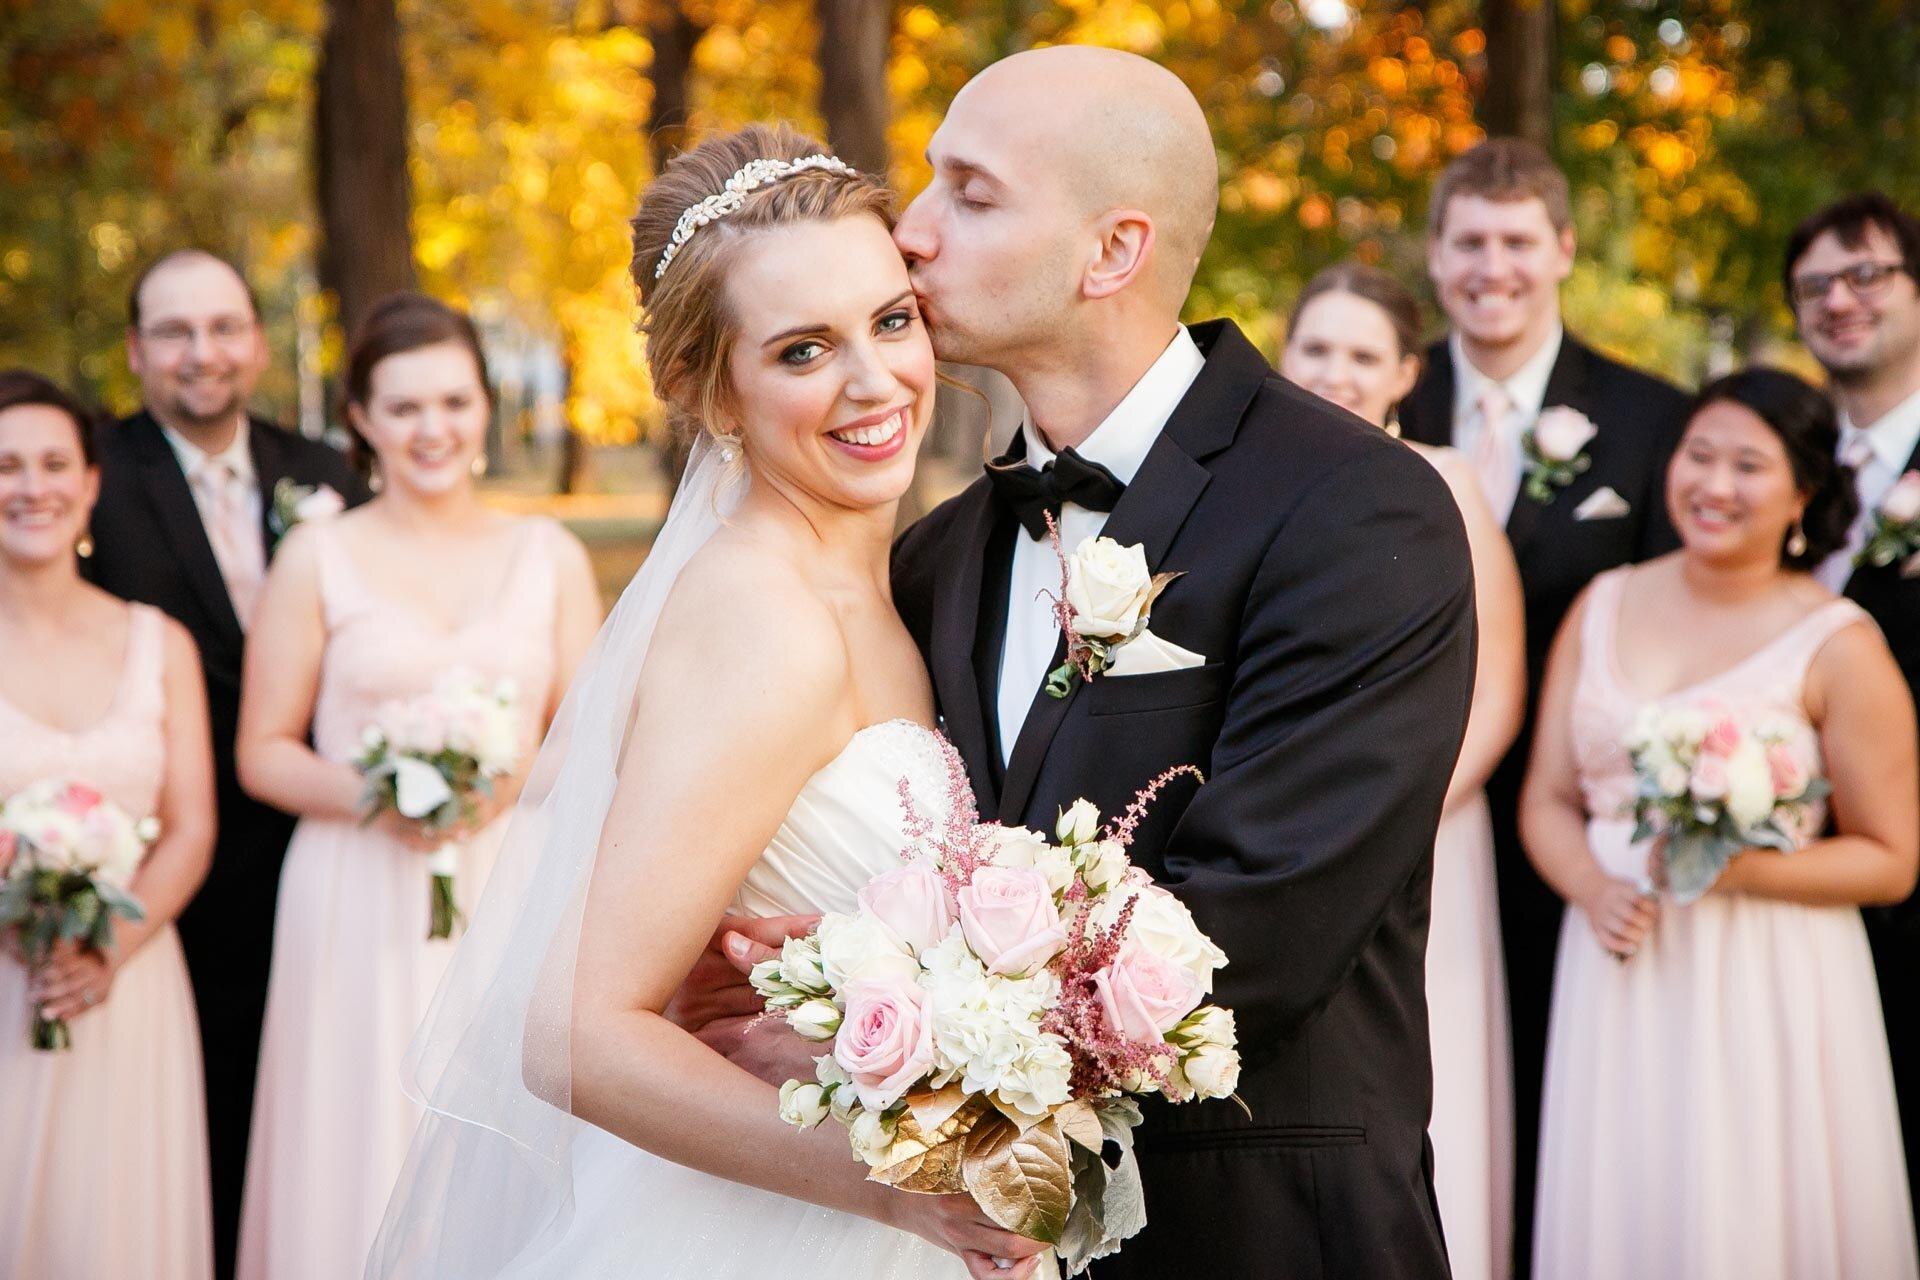 adam-shea-photography-fall-autumn-lighting-engagement-wedding-photos-adam-shea-photography-green-bay-appleton-neenah-photographer-10.jpg